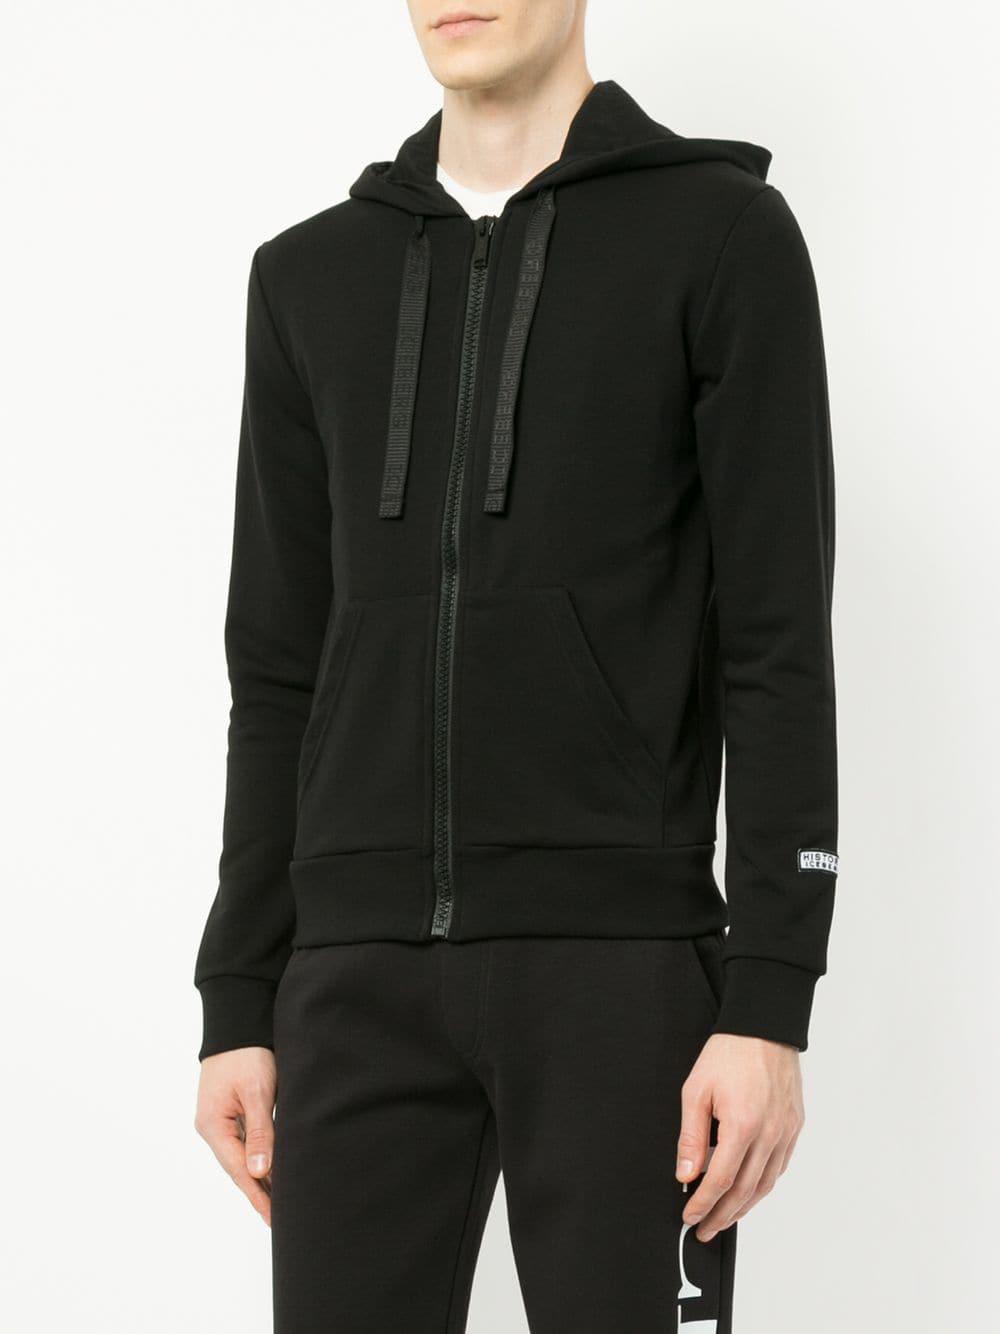 Iceberg Cotton Taz Embroidered Jacket in Black for Men